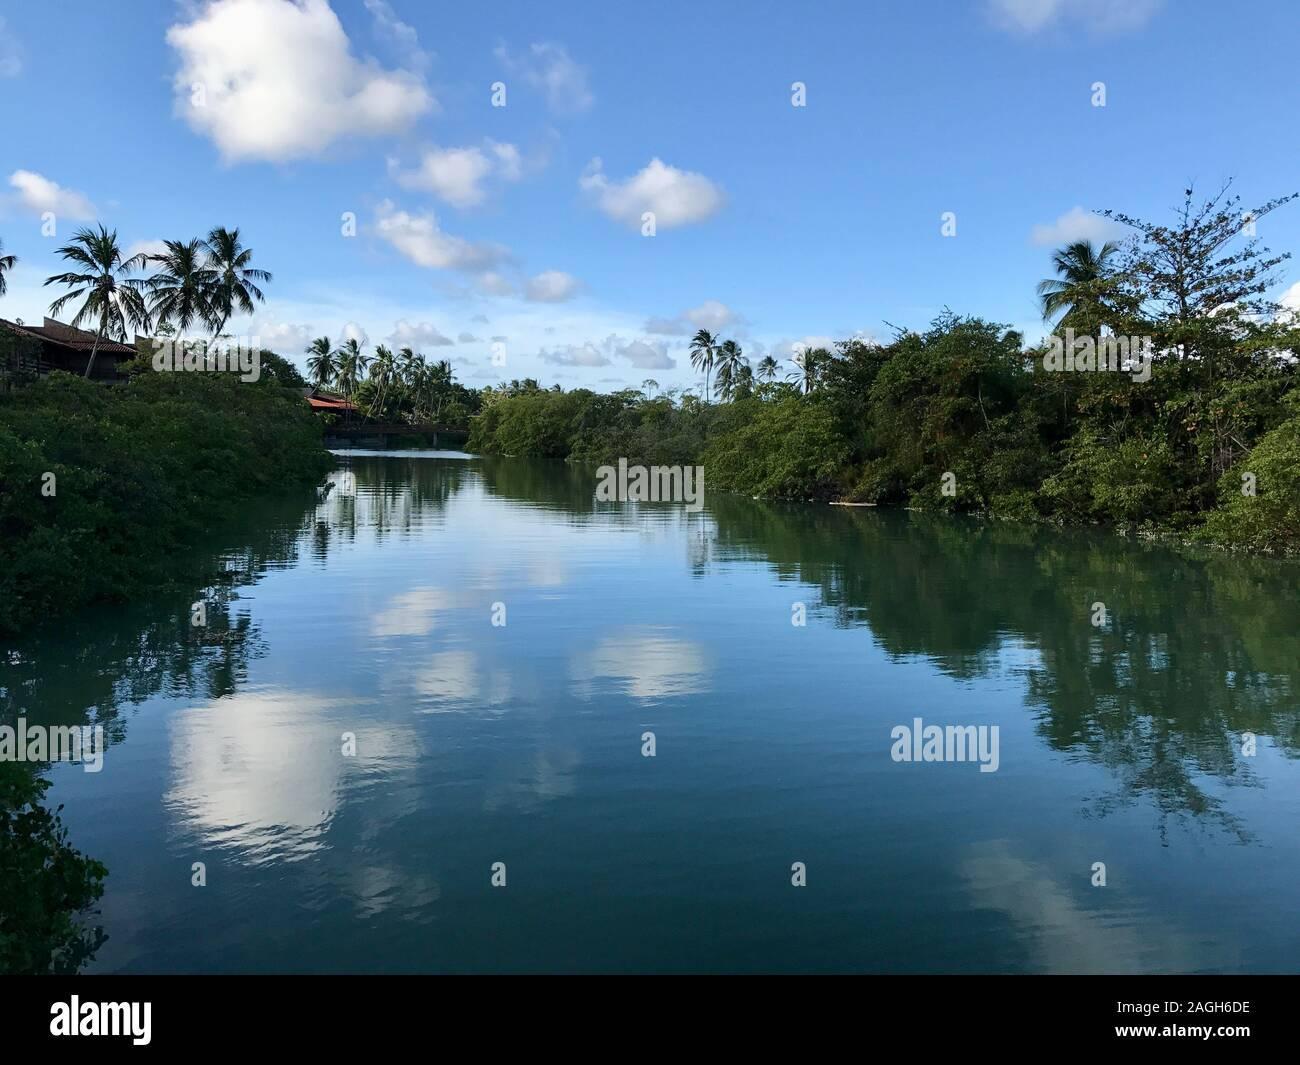 Reflections in water in Maragogi Beach, Alagoas State, Brazil Stock Photo